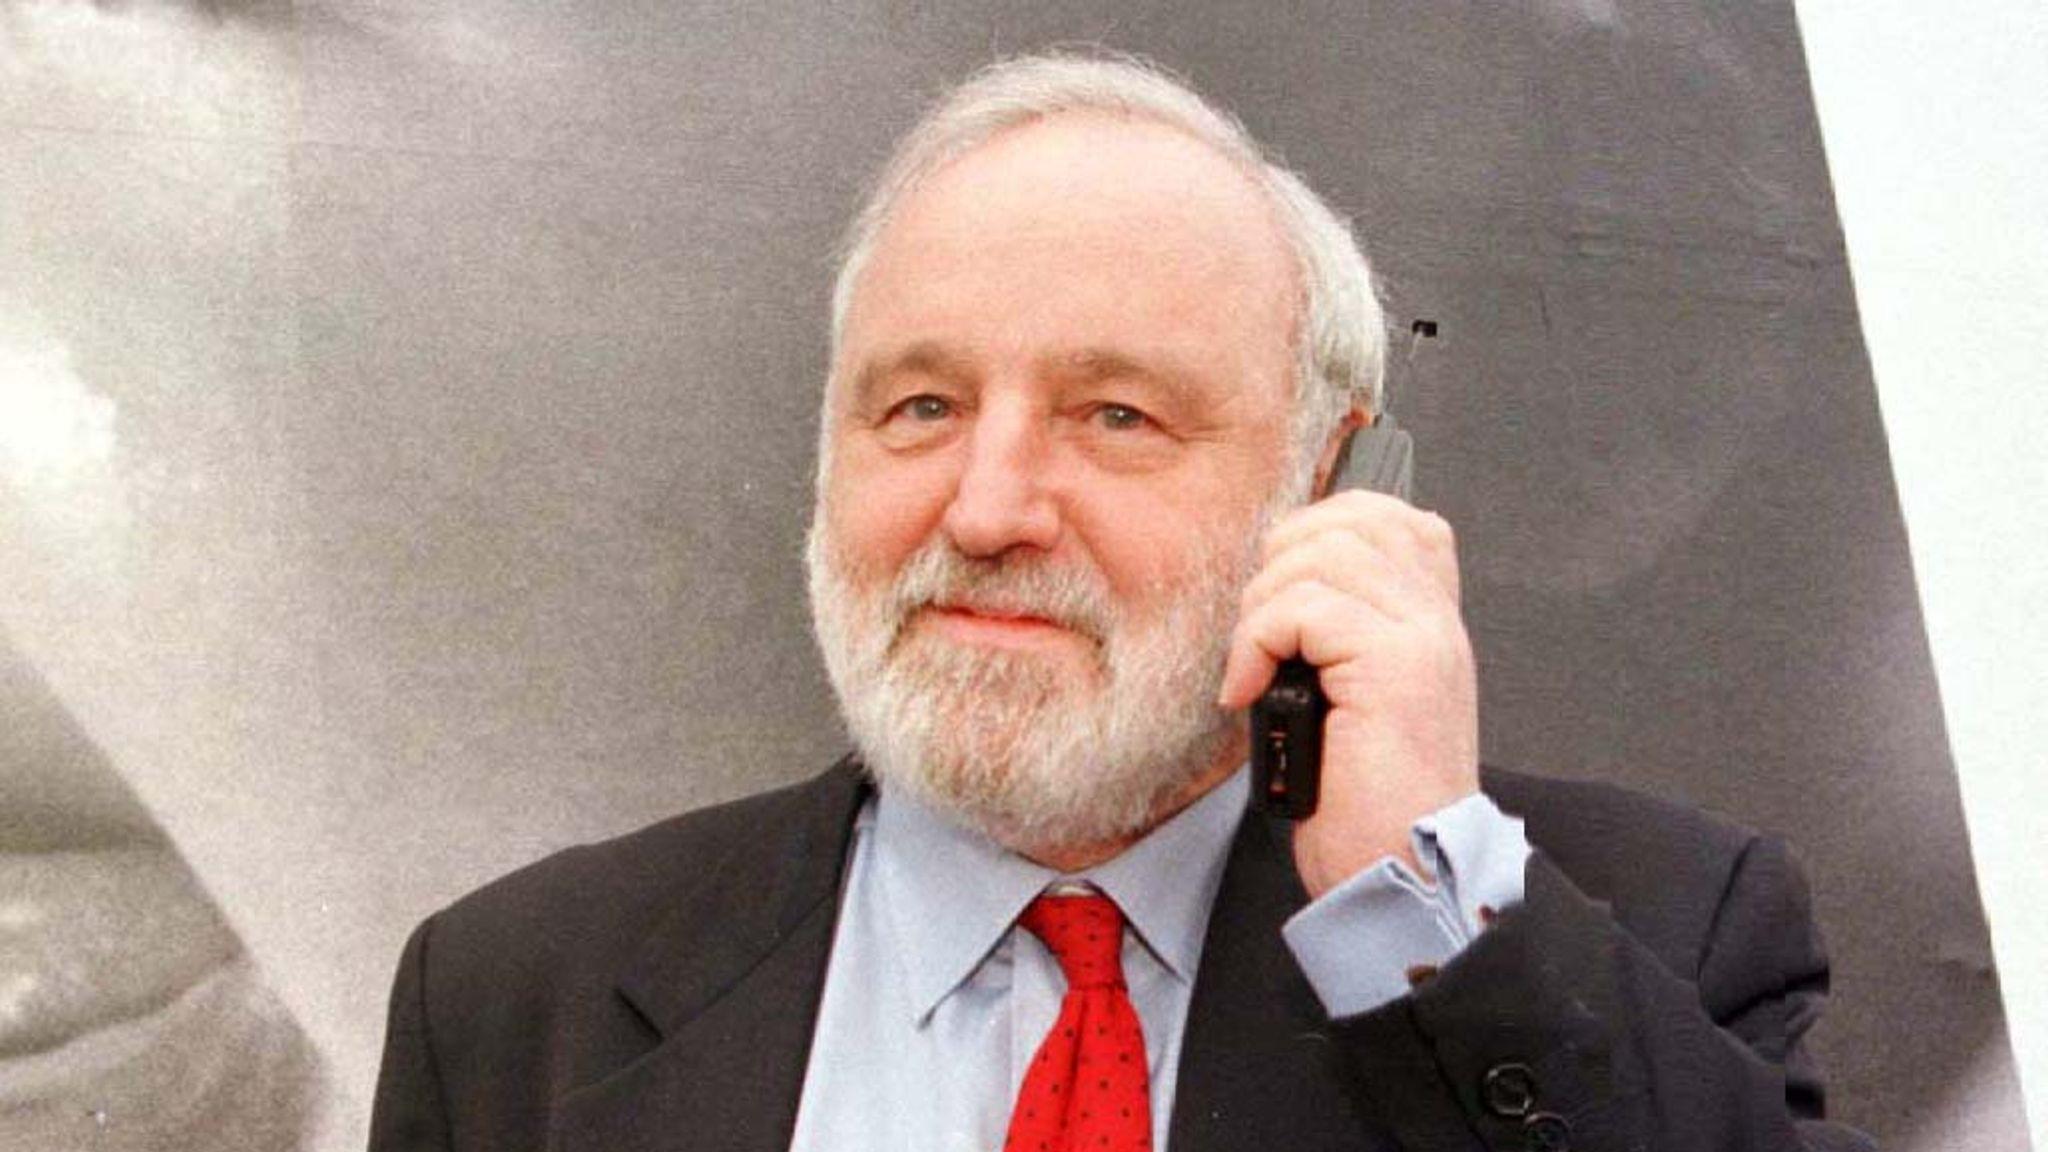 Frank Dobson: Ex-Labour health secretary Dobson dies aged 79